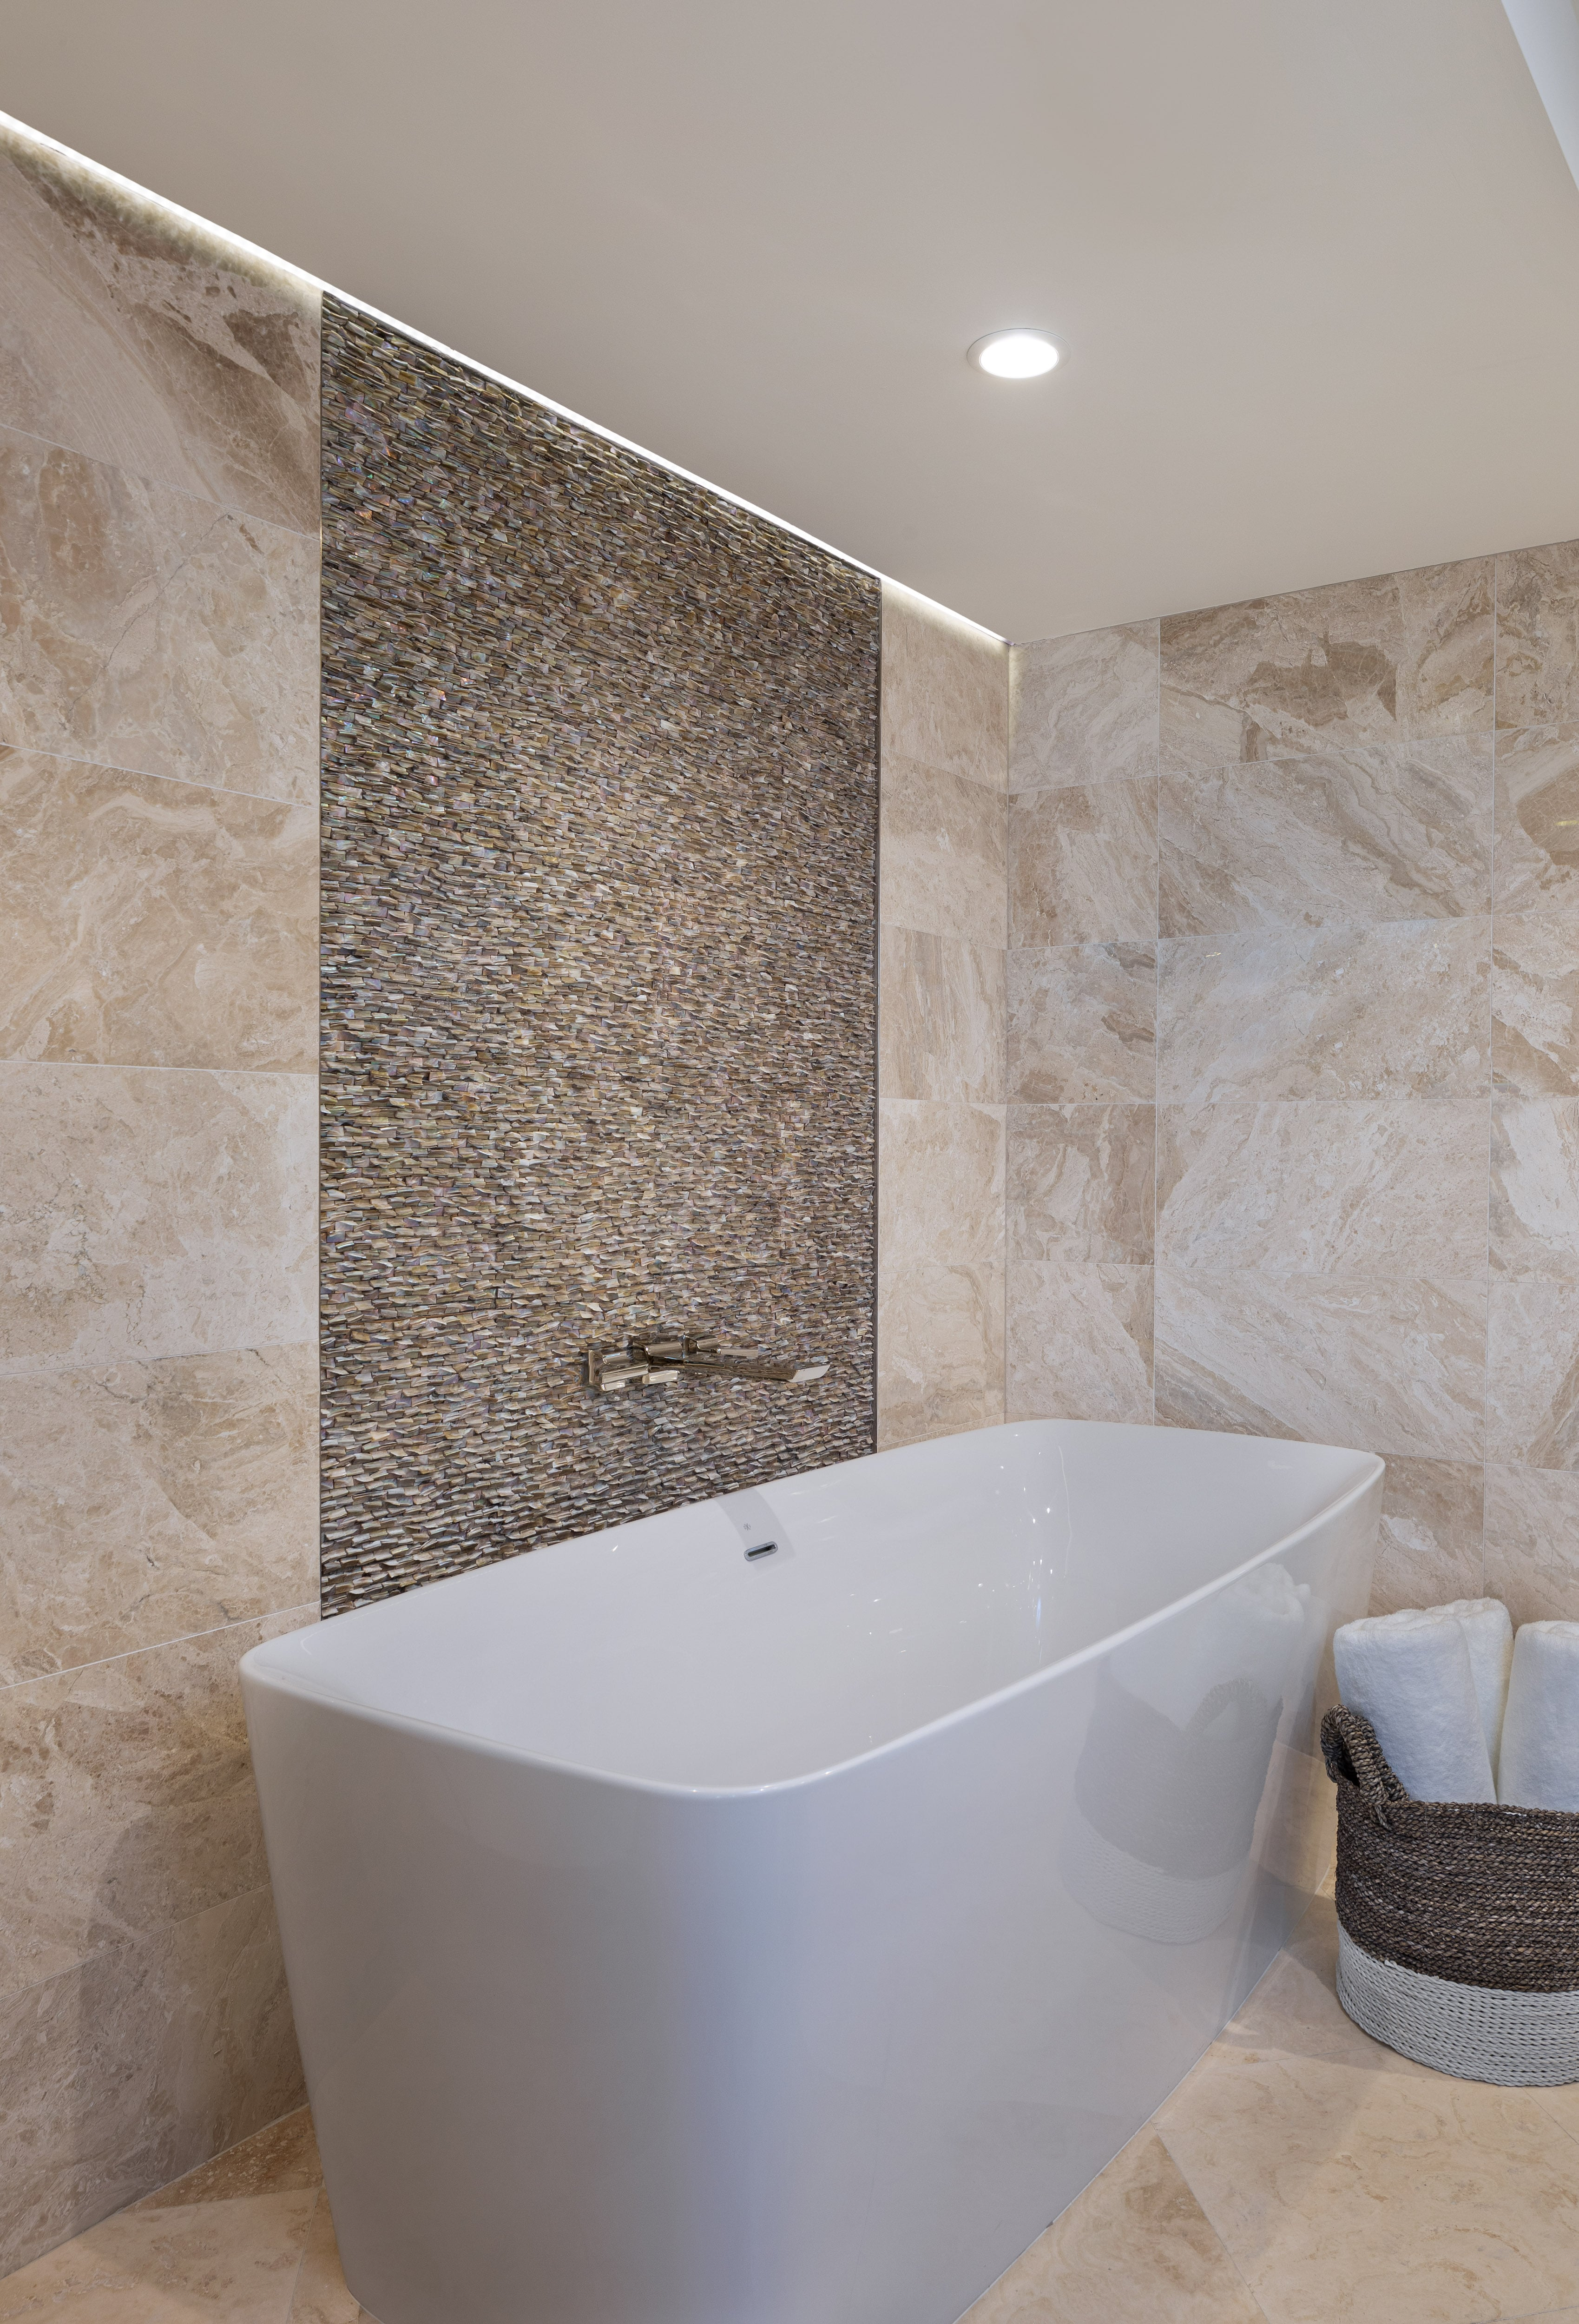 St. Pierre Condo Remodel Master Bath Tub